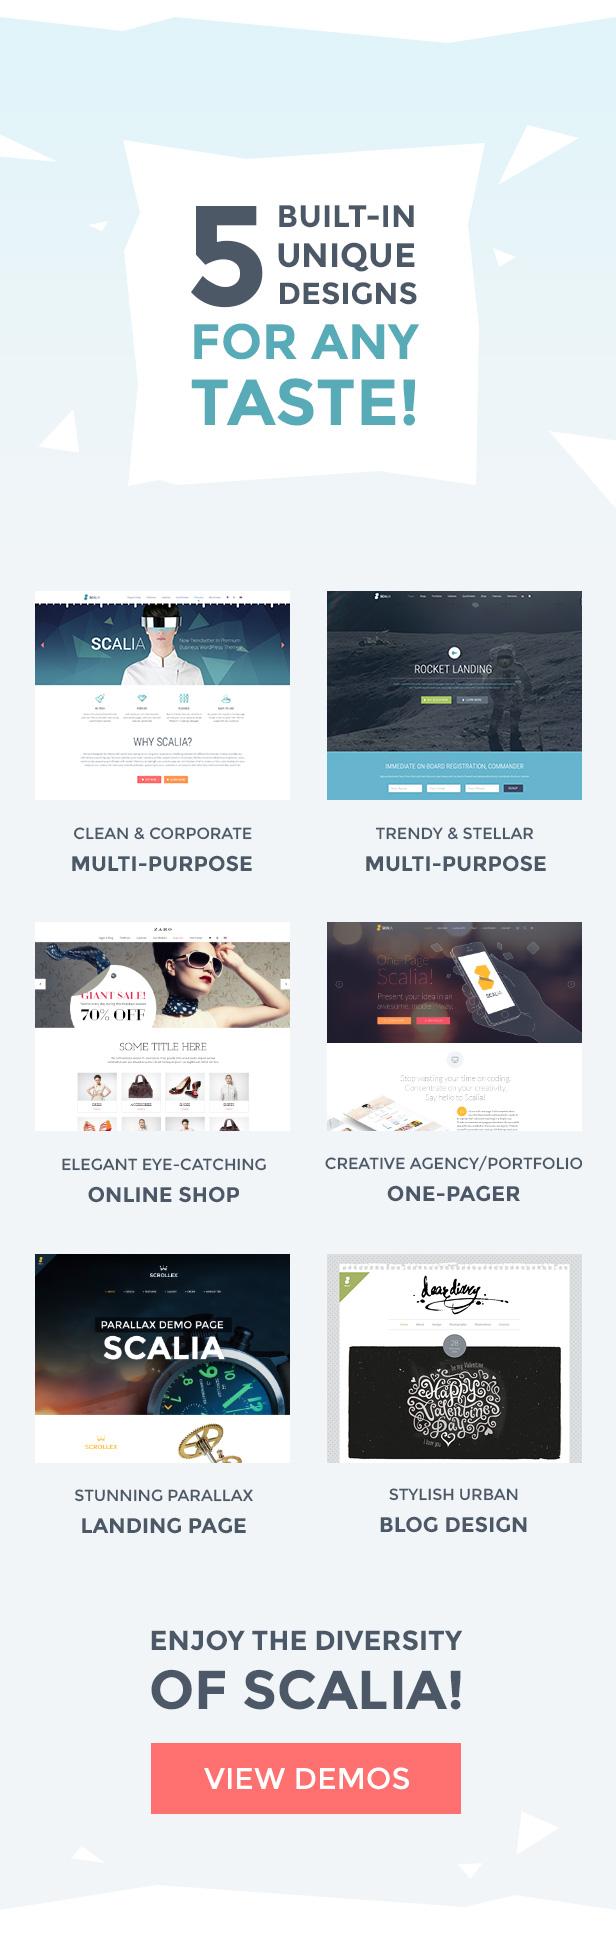 01 - Scalia - Multi-Concept Business, Shop, One-Page, Blog Theme